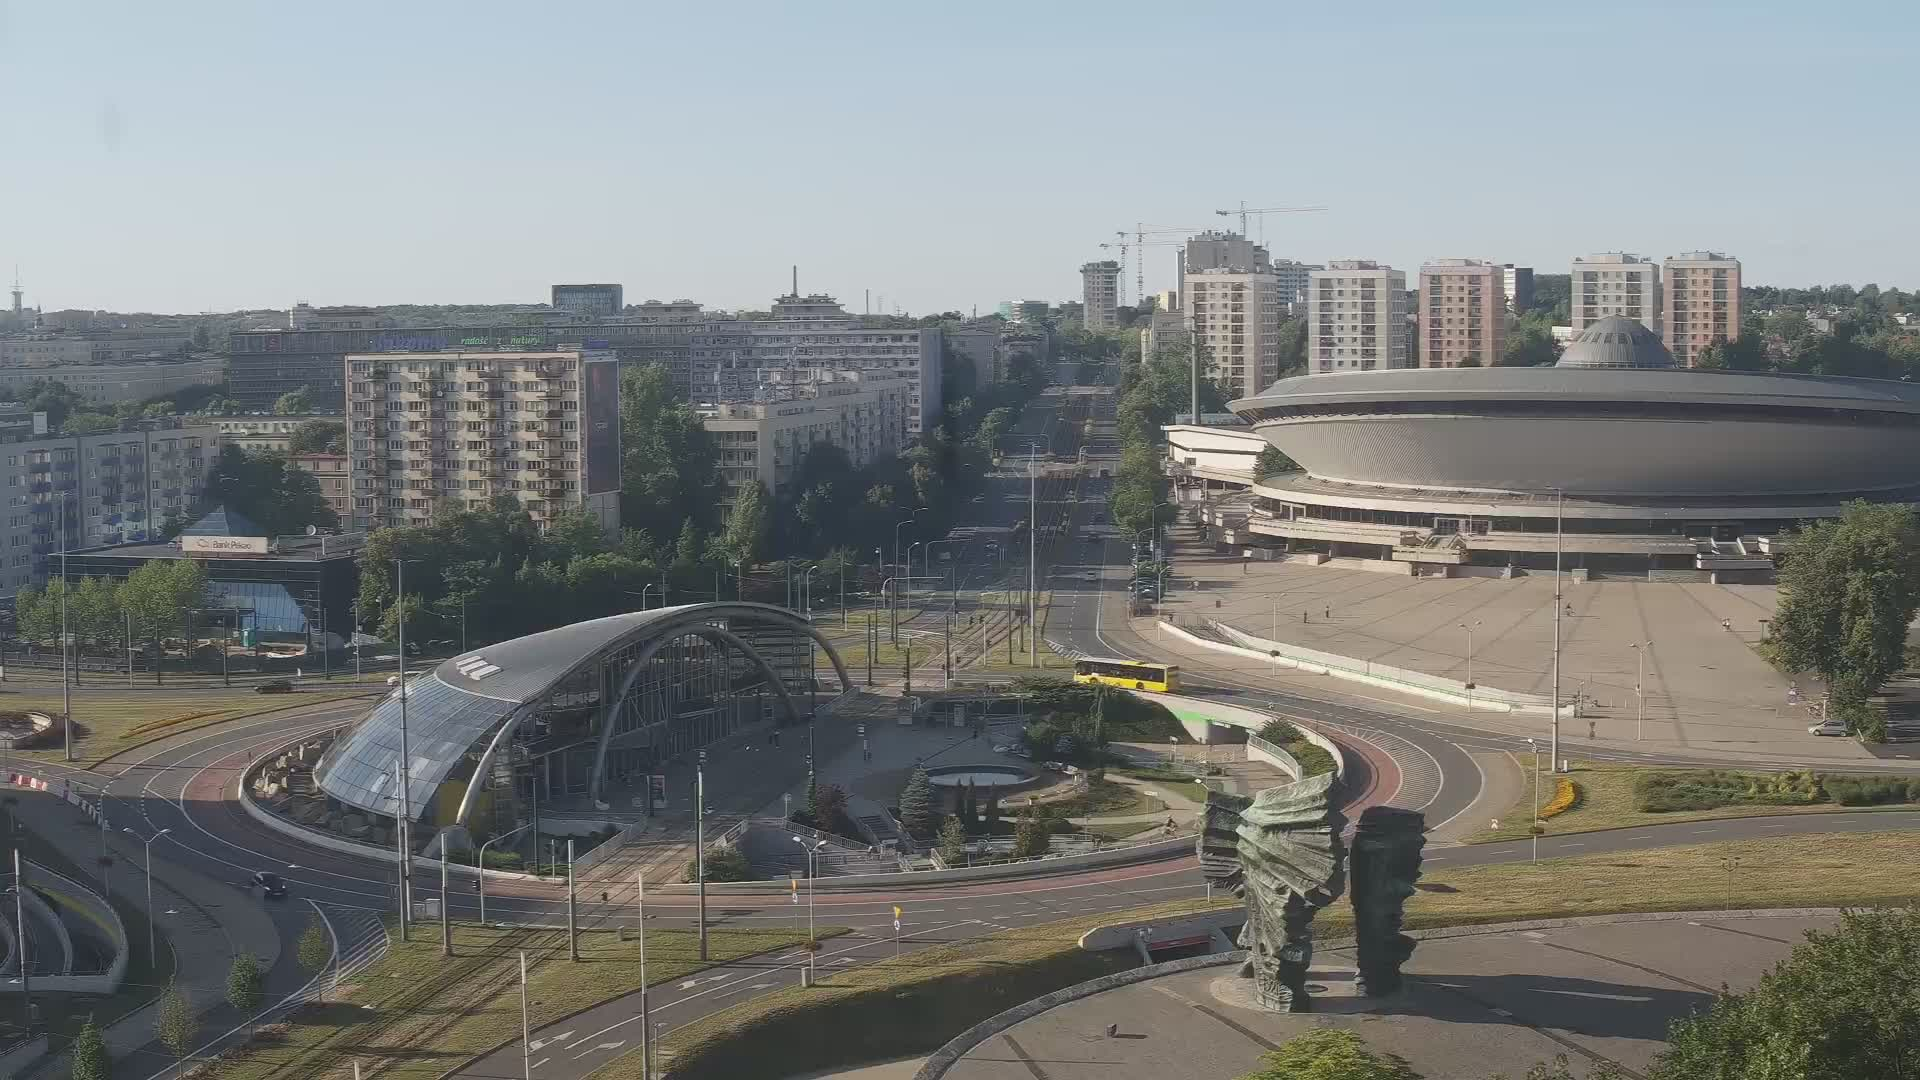 katowice escort webcam live